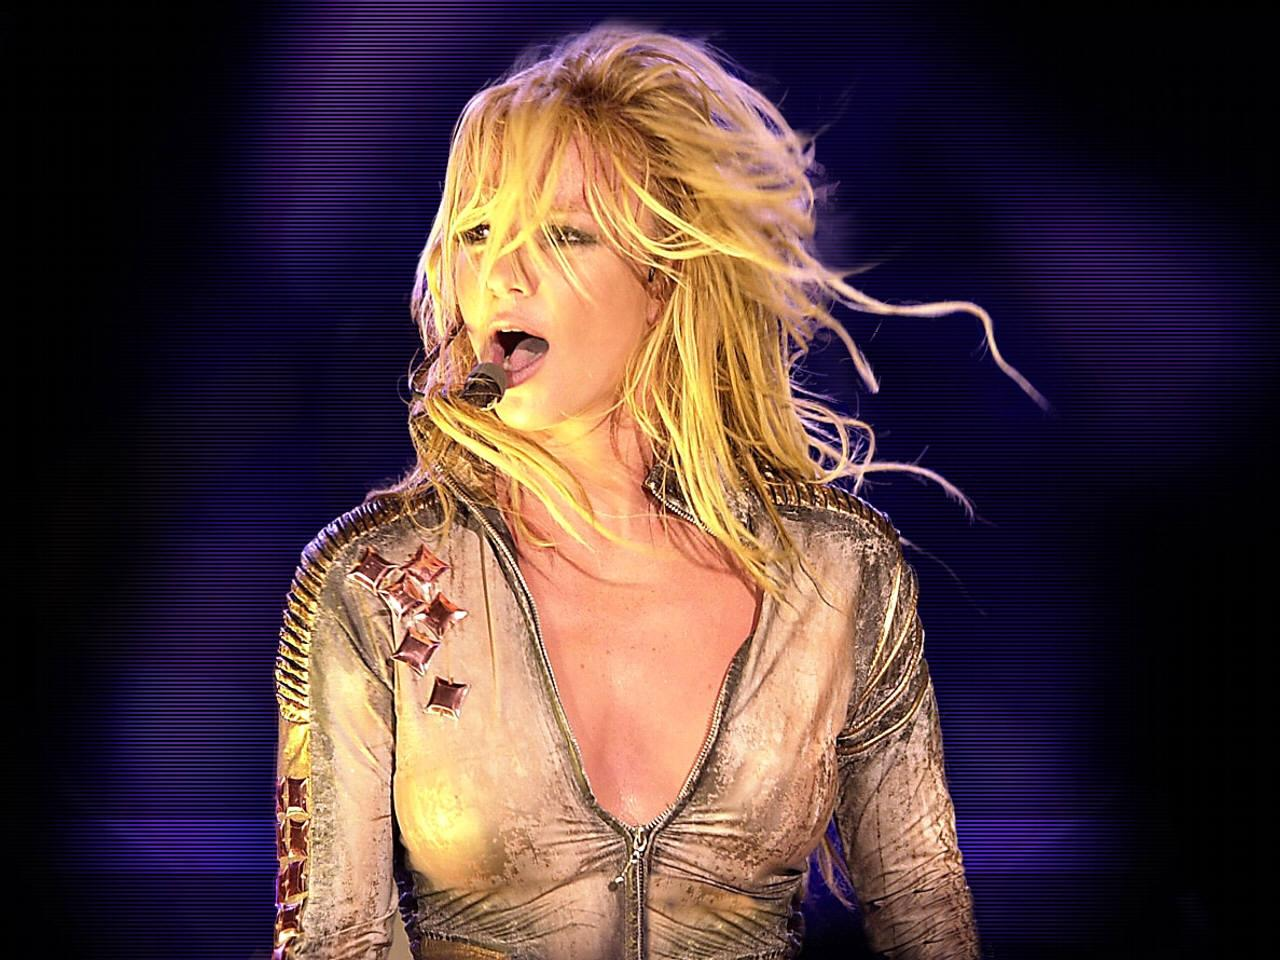 Top Teen Arriest Britney Jean Spears Hot Topic